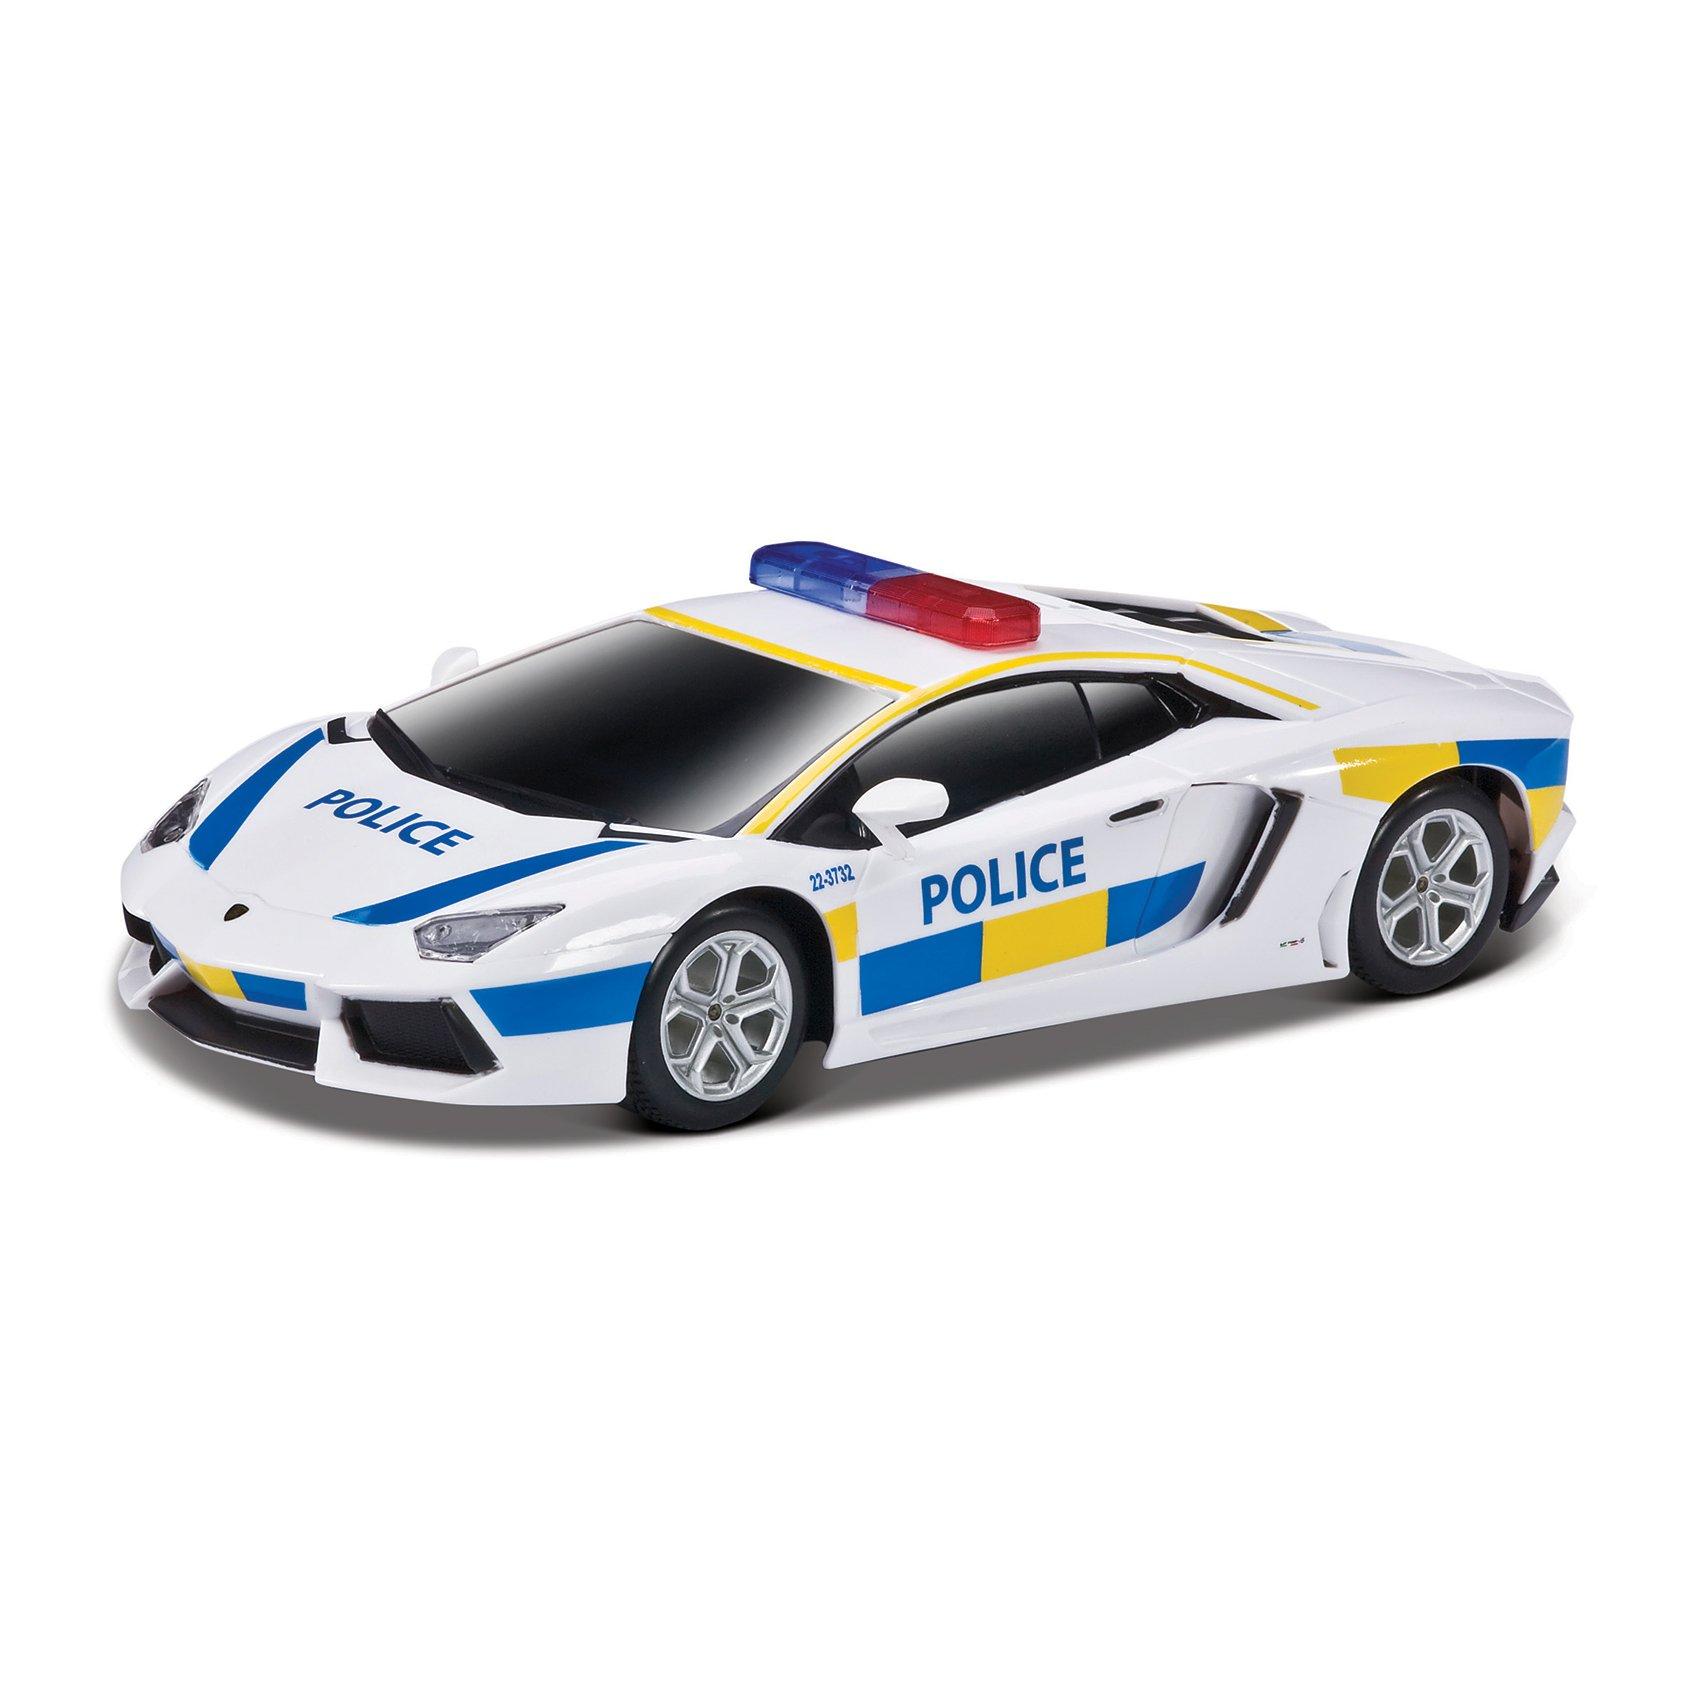 Masinuta Maisto MotoSounds Lamborghini Aventador LP700-4 (masina de politie) 1:24